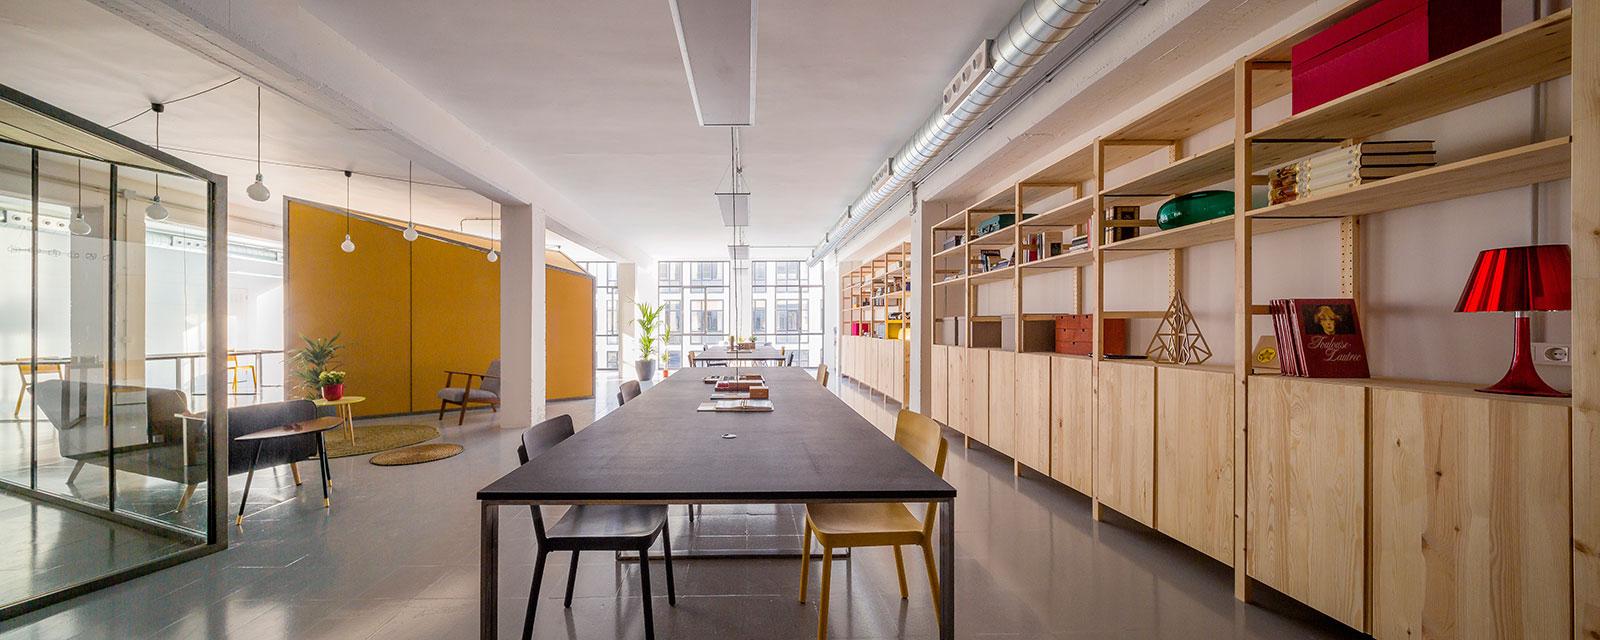 Barcelona coworking space, Zamness